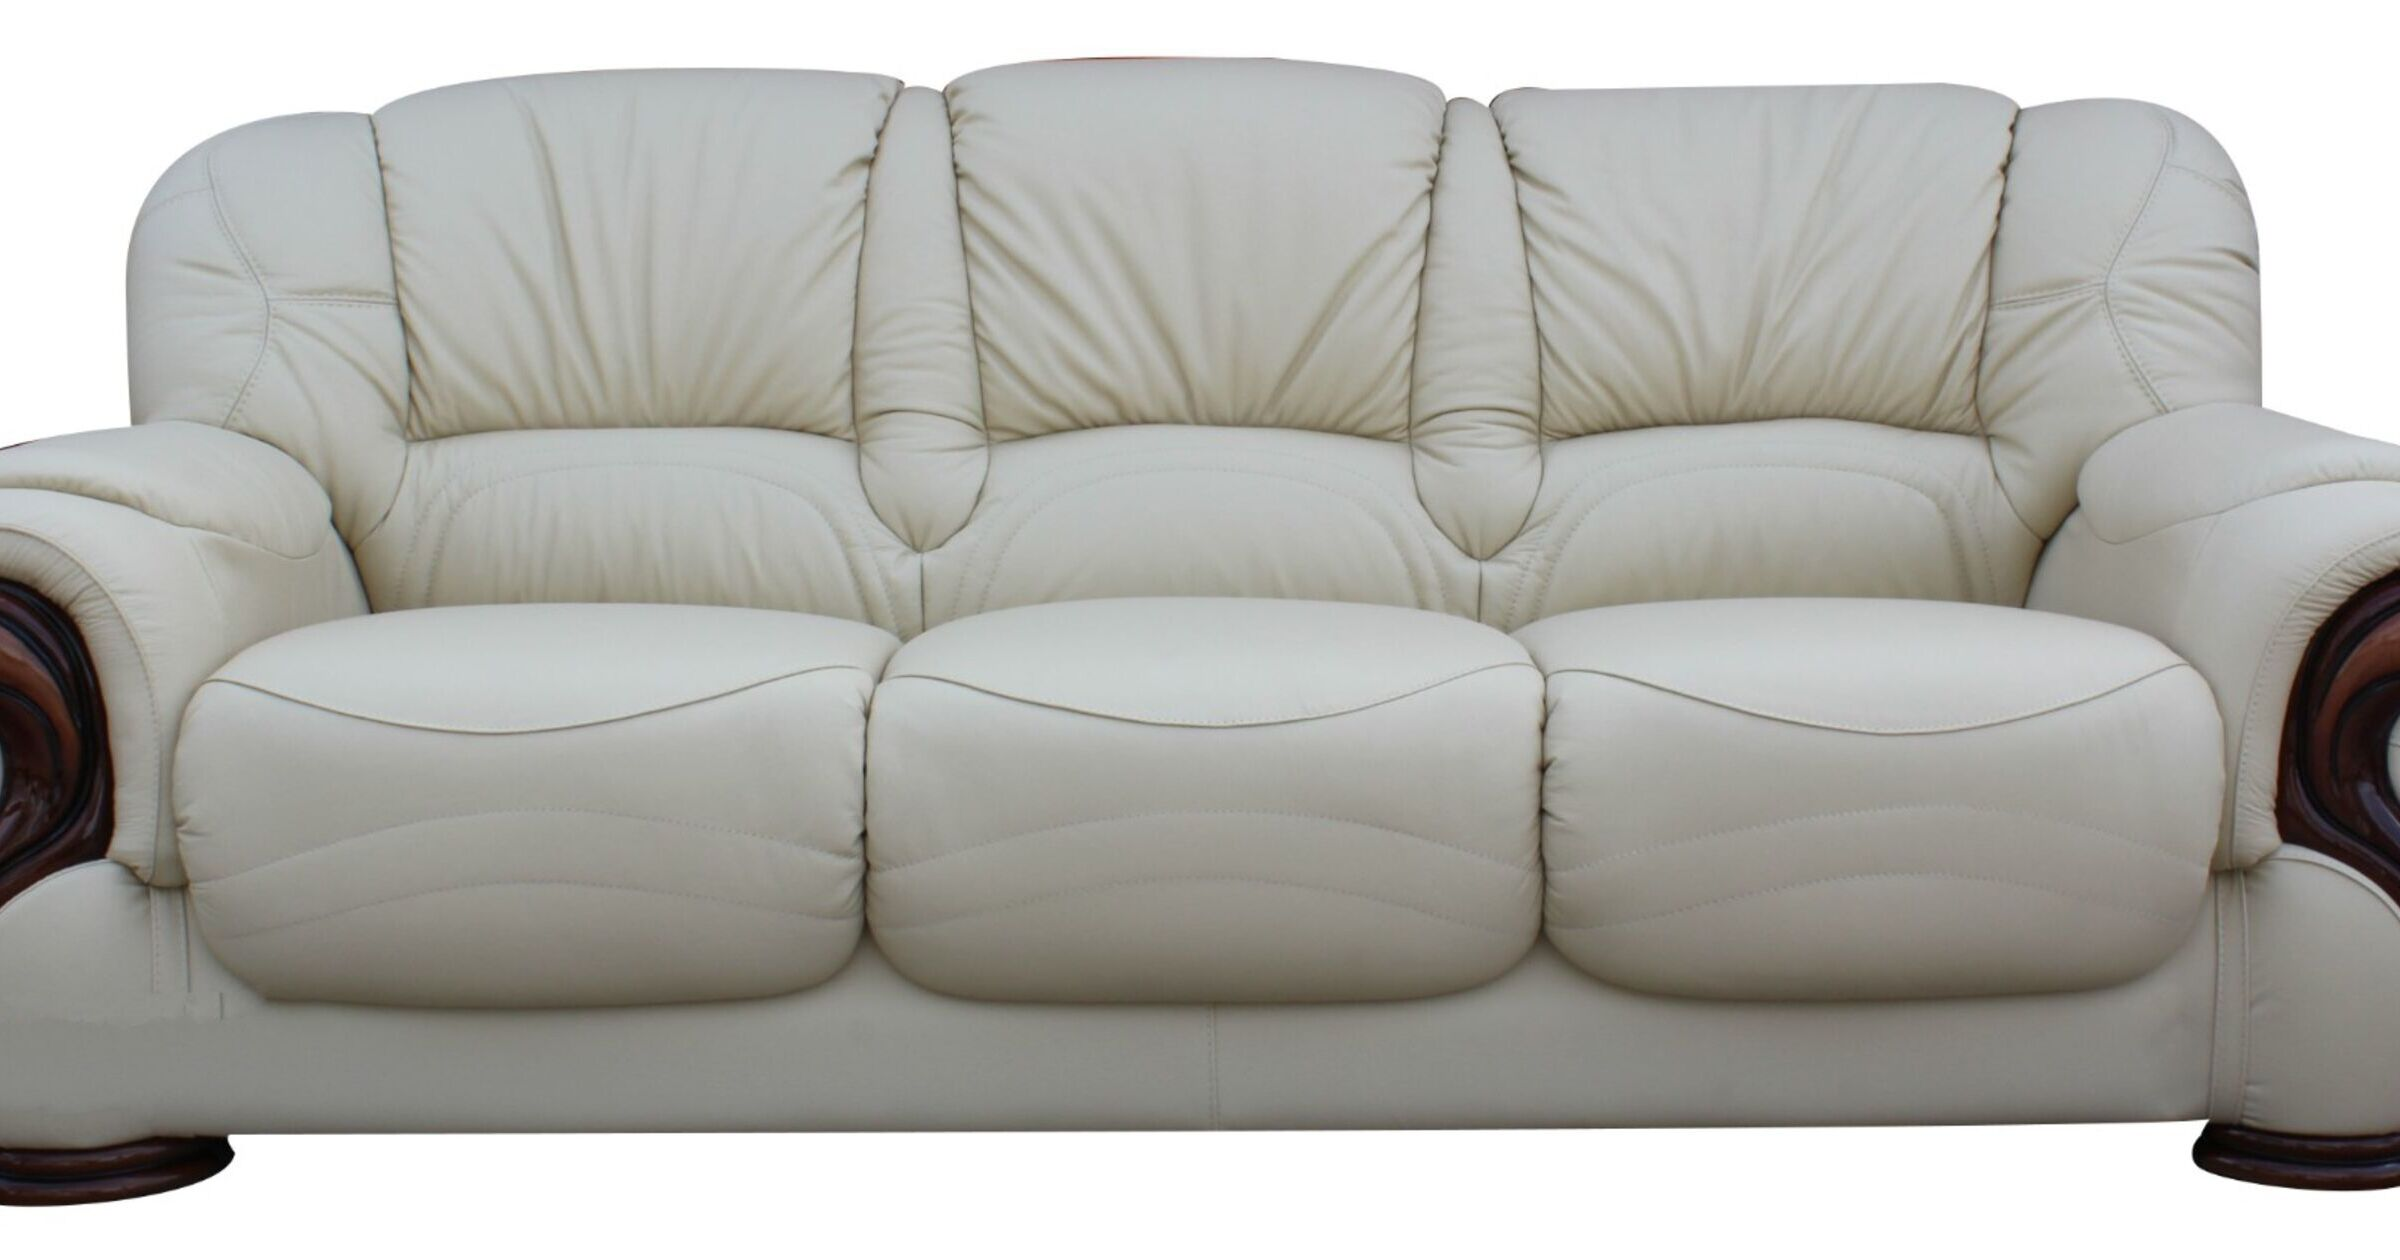 Susanna Italian Leather 3 Seater Sofa Settee Cream Offer